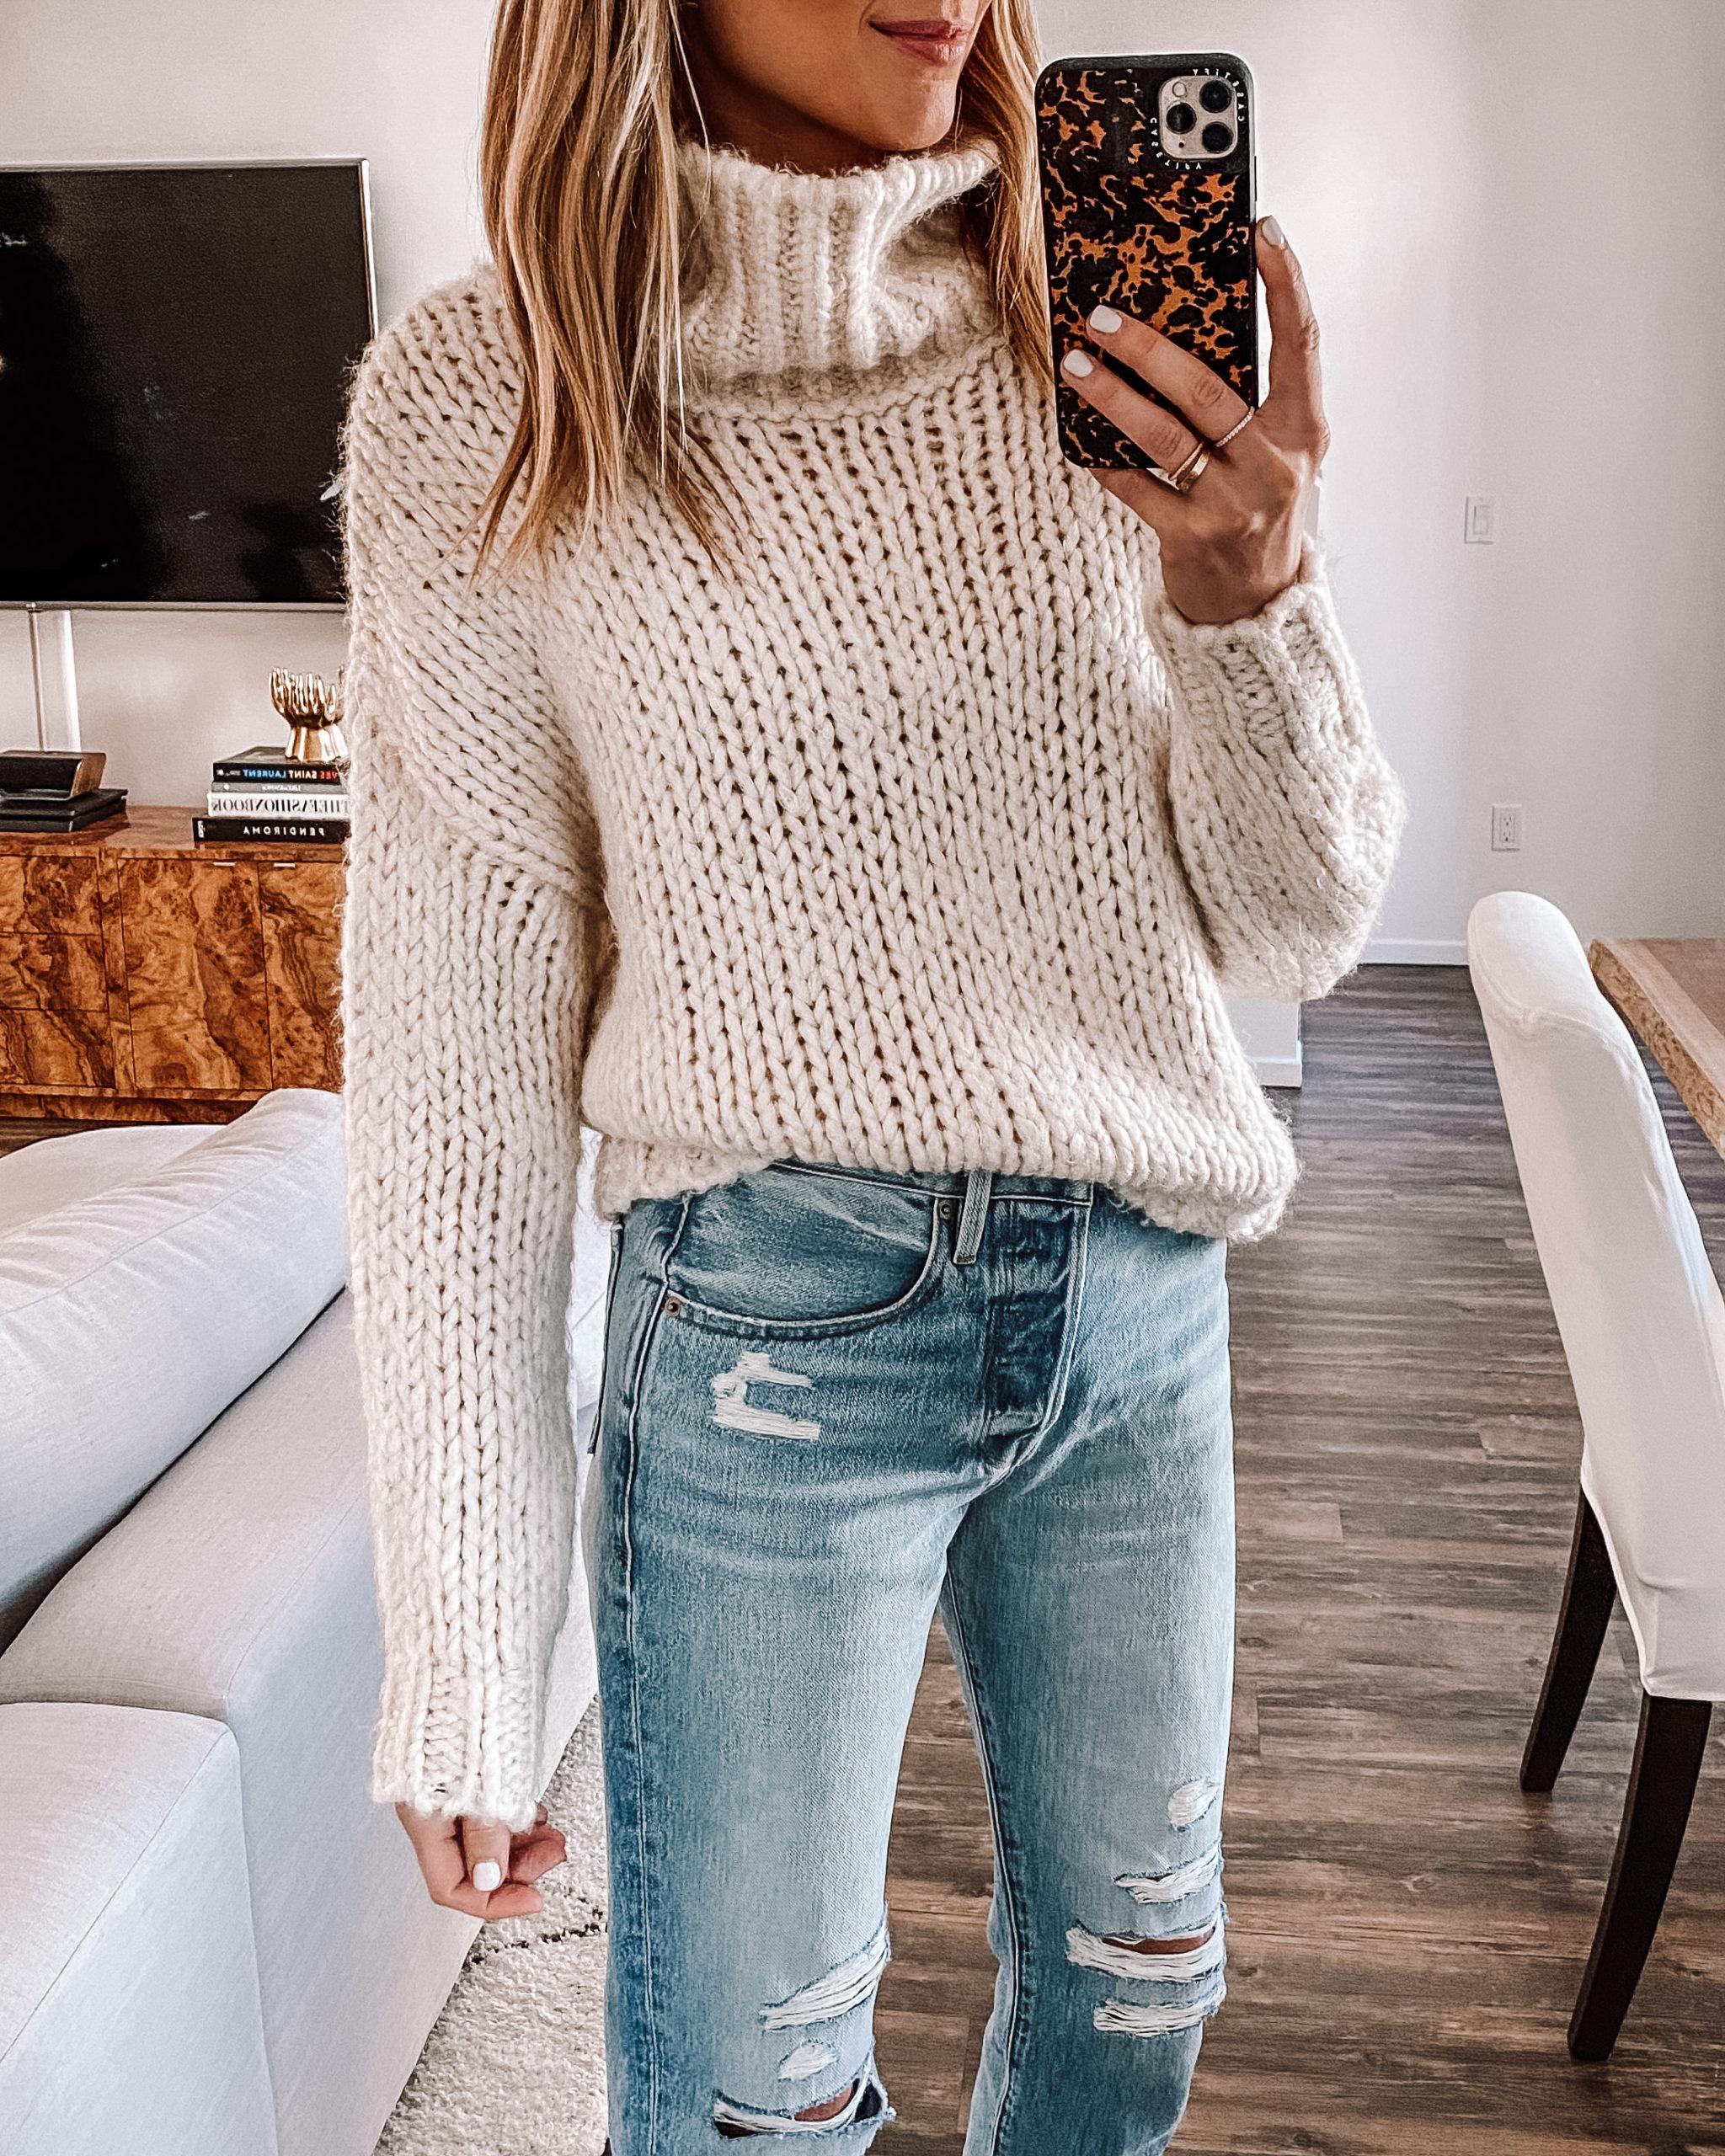 Fashion Jackson Wearing Topshop Ivory Chunky Turtleneck Sweater